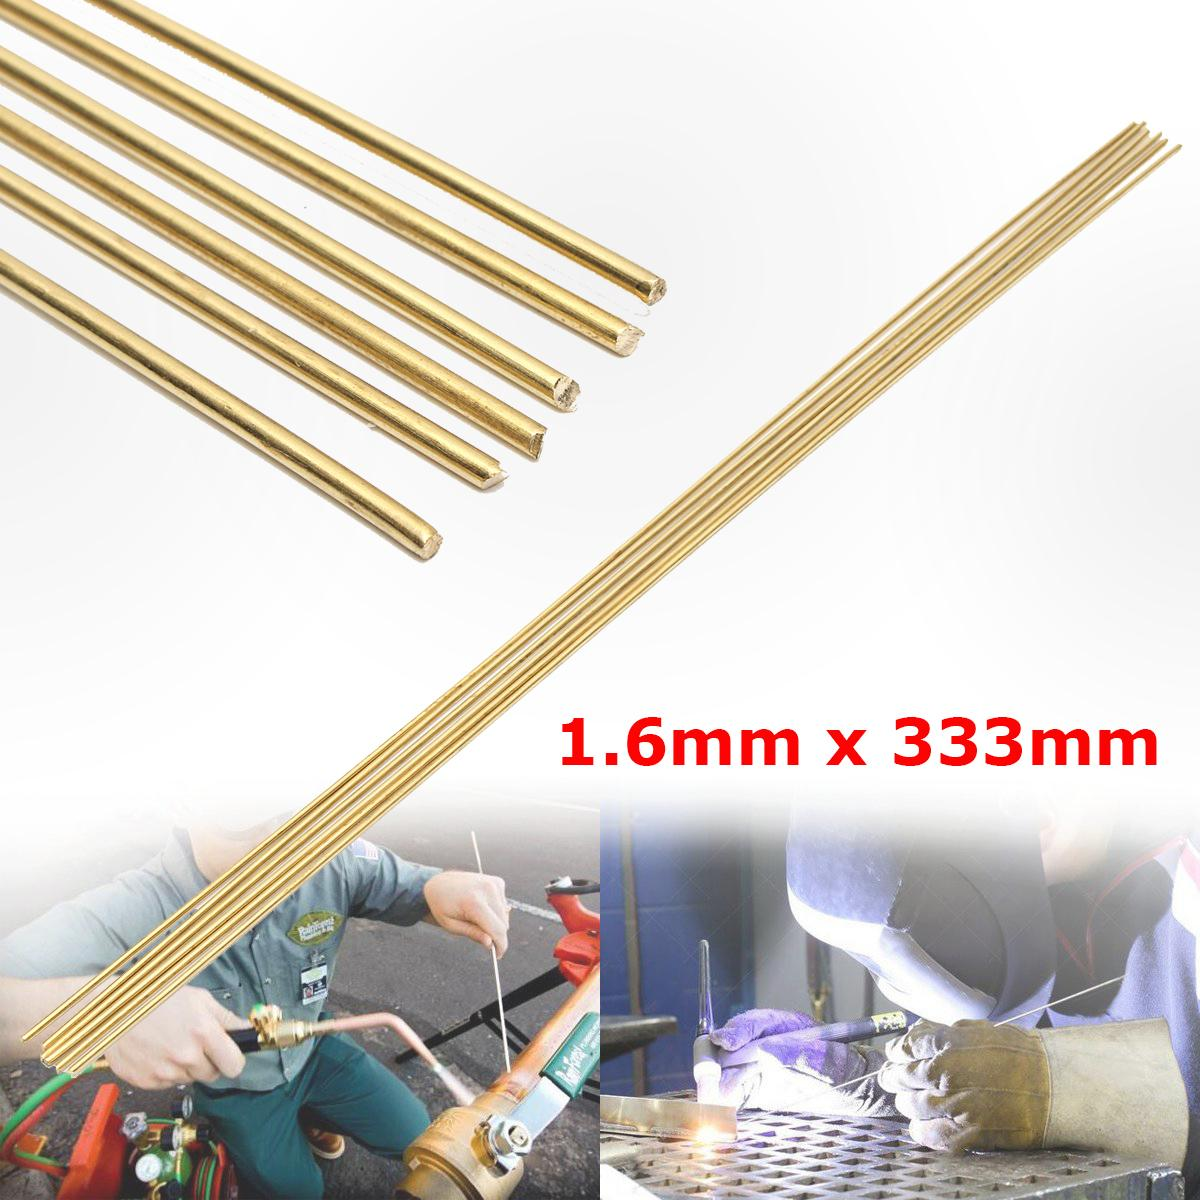 ASTM B16 3//4 Across Flats 60 Length 360 Brass Hex Bar Precision Tolerance Finish Unpolished H02 Temper Mill